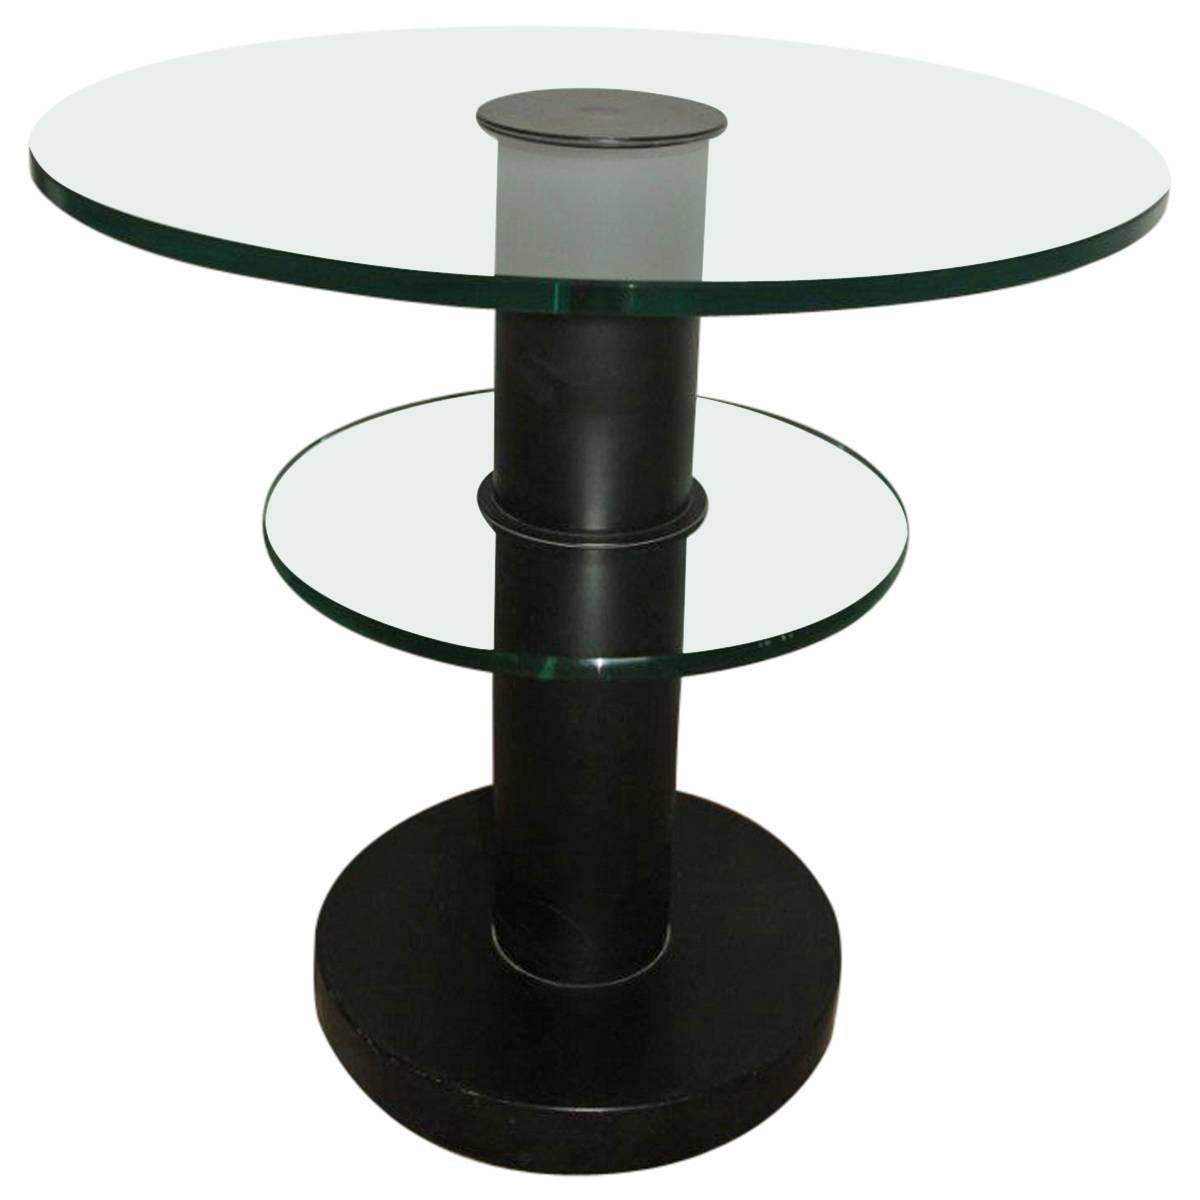 Round Coffee Table Gio Ponti For Fontana Arte 1960s Black Trasparent Glass Elegant Coffee Table Round Coffee Table Mahogany Coffee Table [ 1200 x 1200 Pixel ]